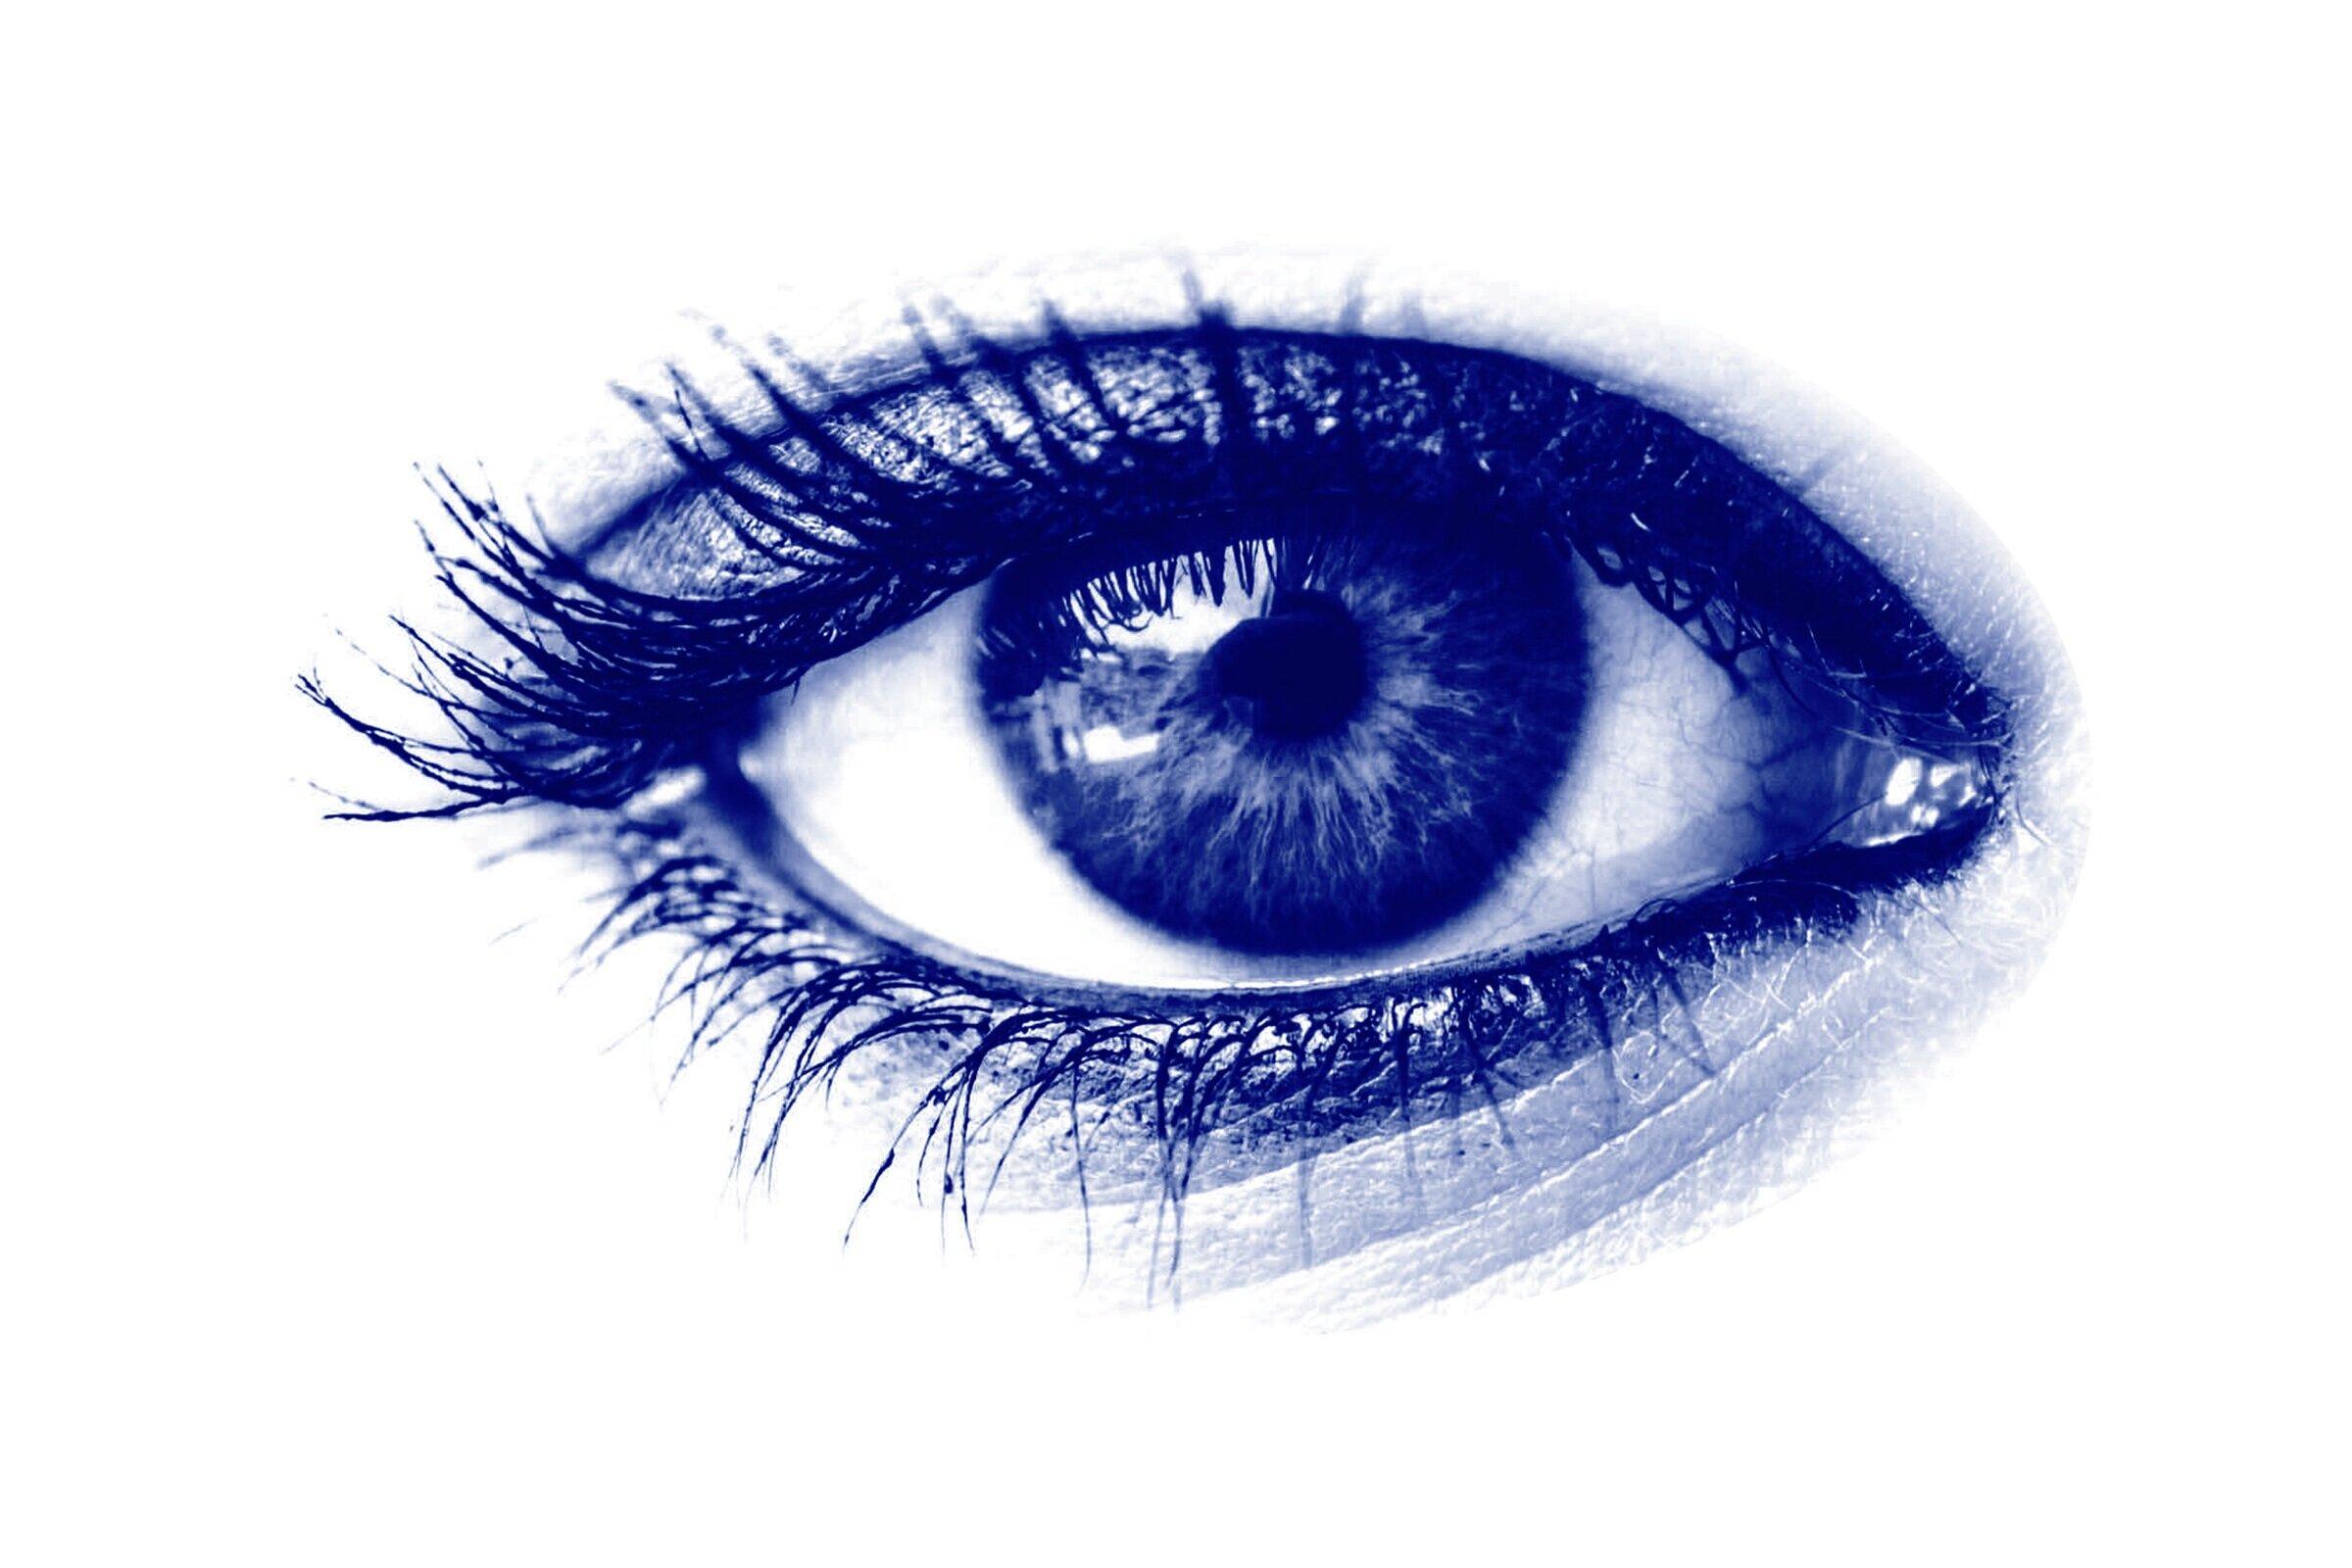 bw_isolated_eye.jpg